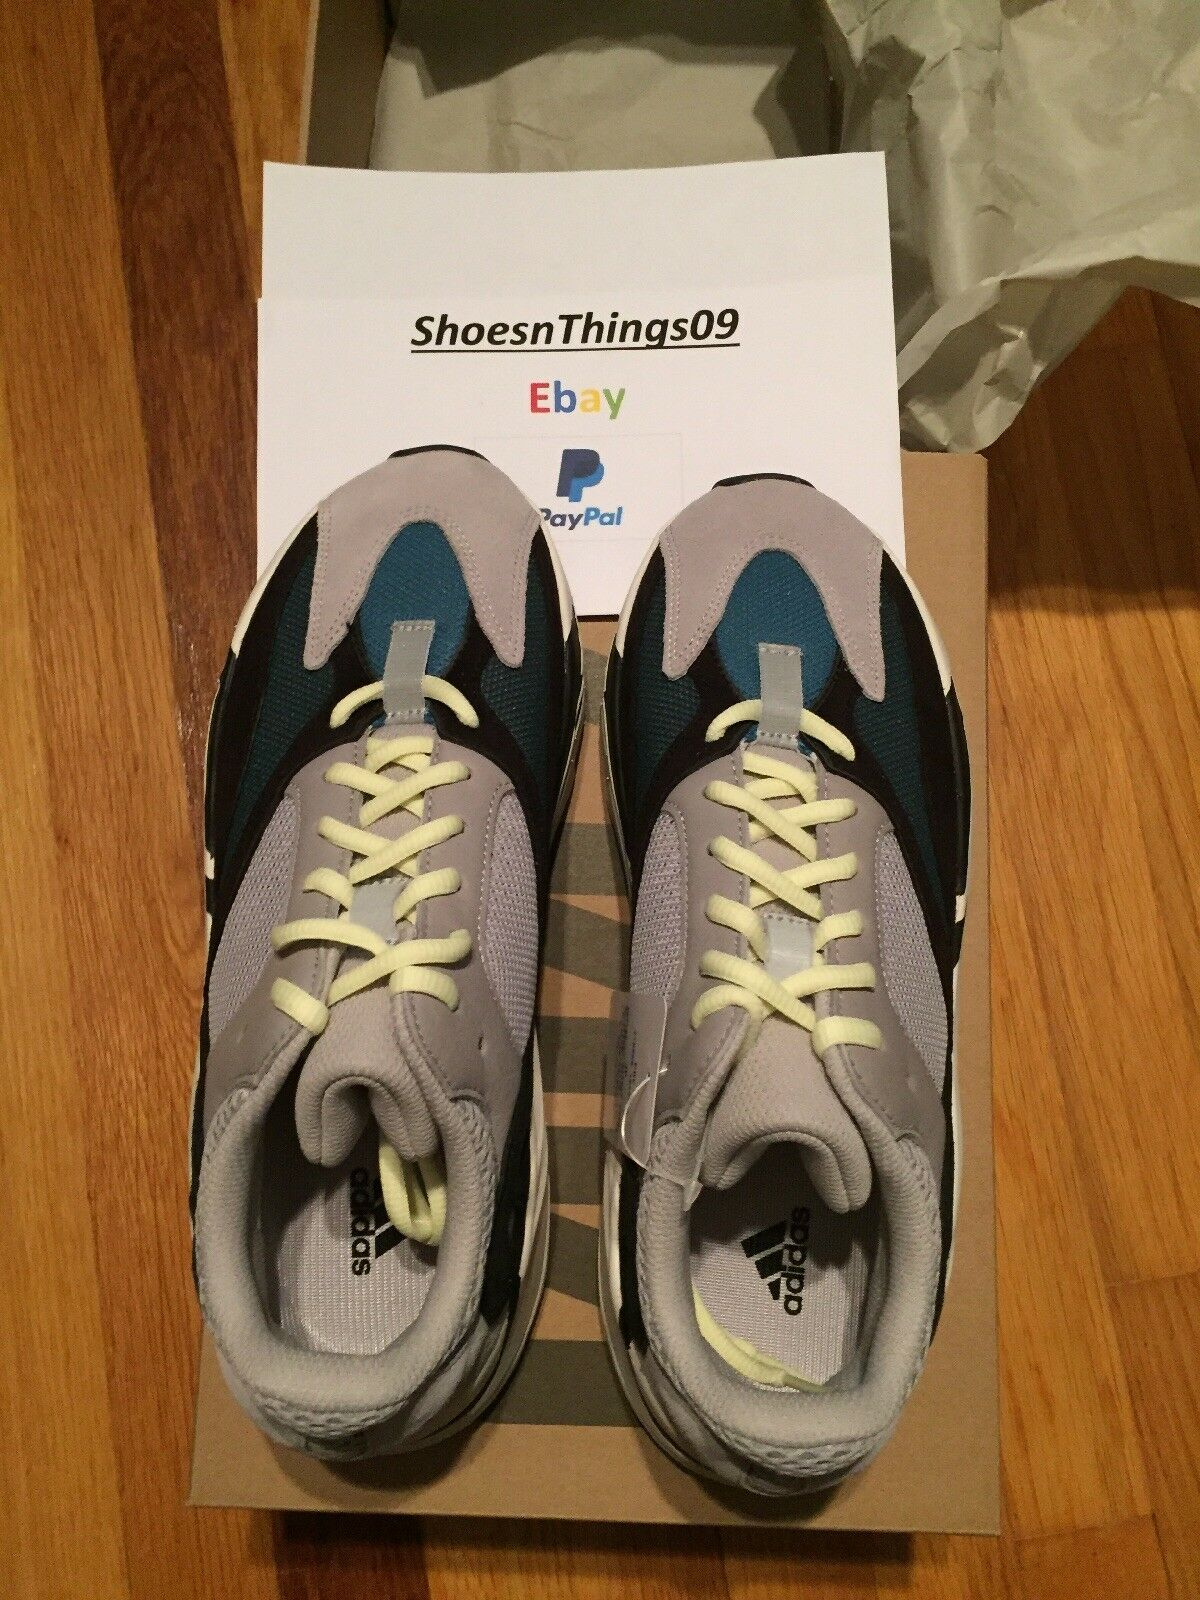 online store 90c2f a5631 ... Adidas Yeezy Ondata Ondata Yeezy Runner 700 Dimensioni 9.5 ...